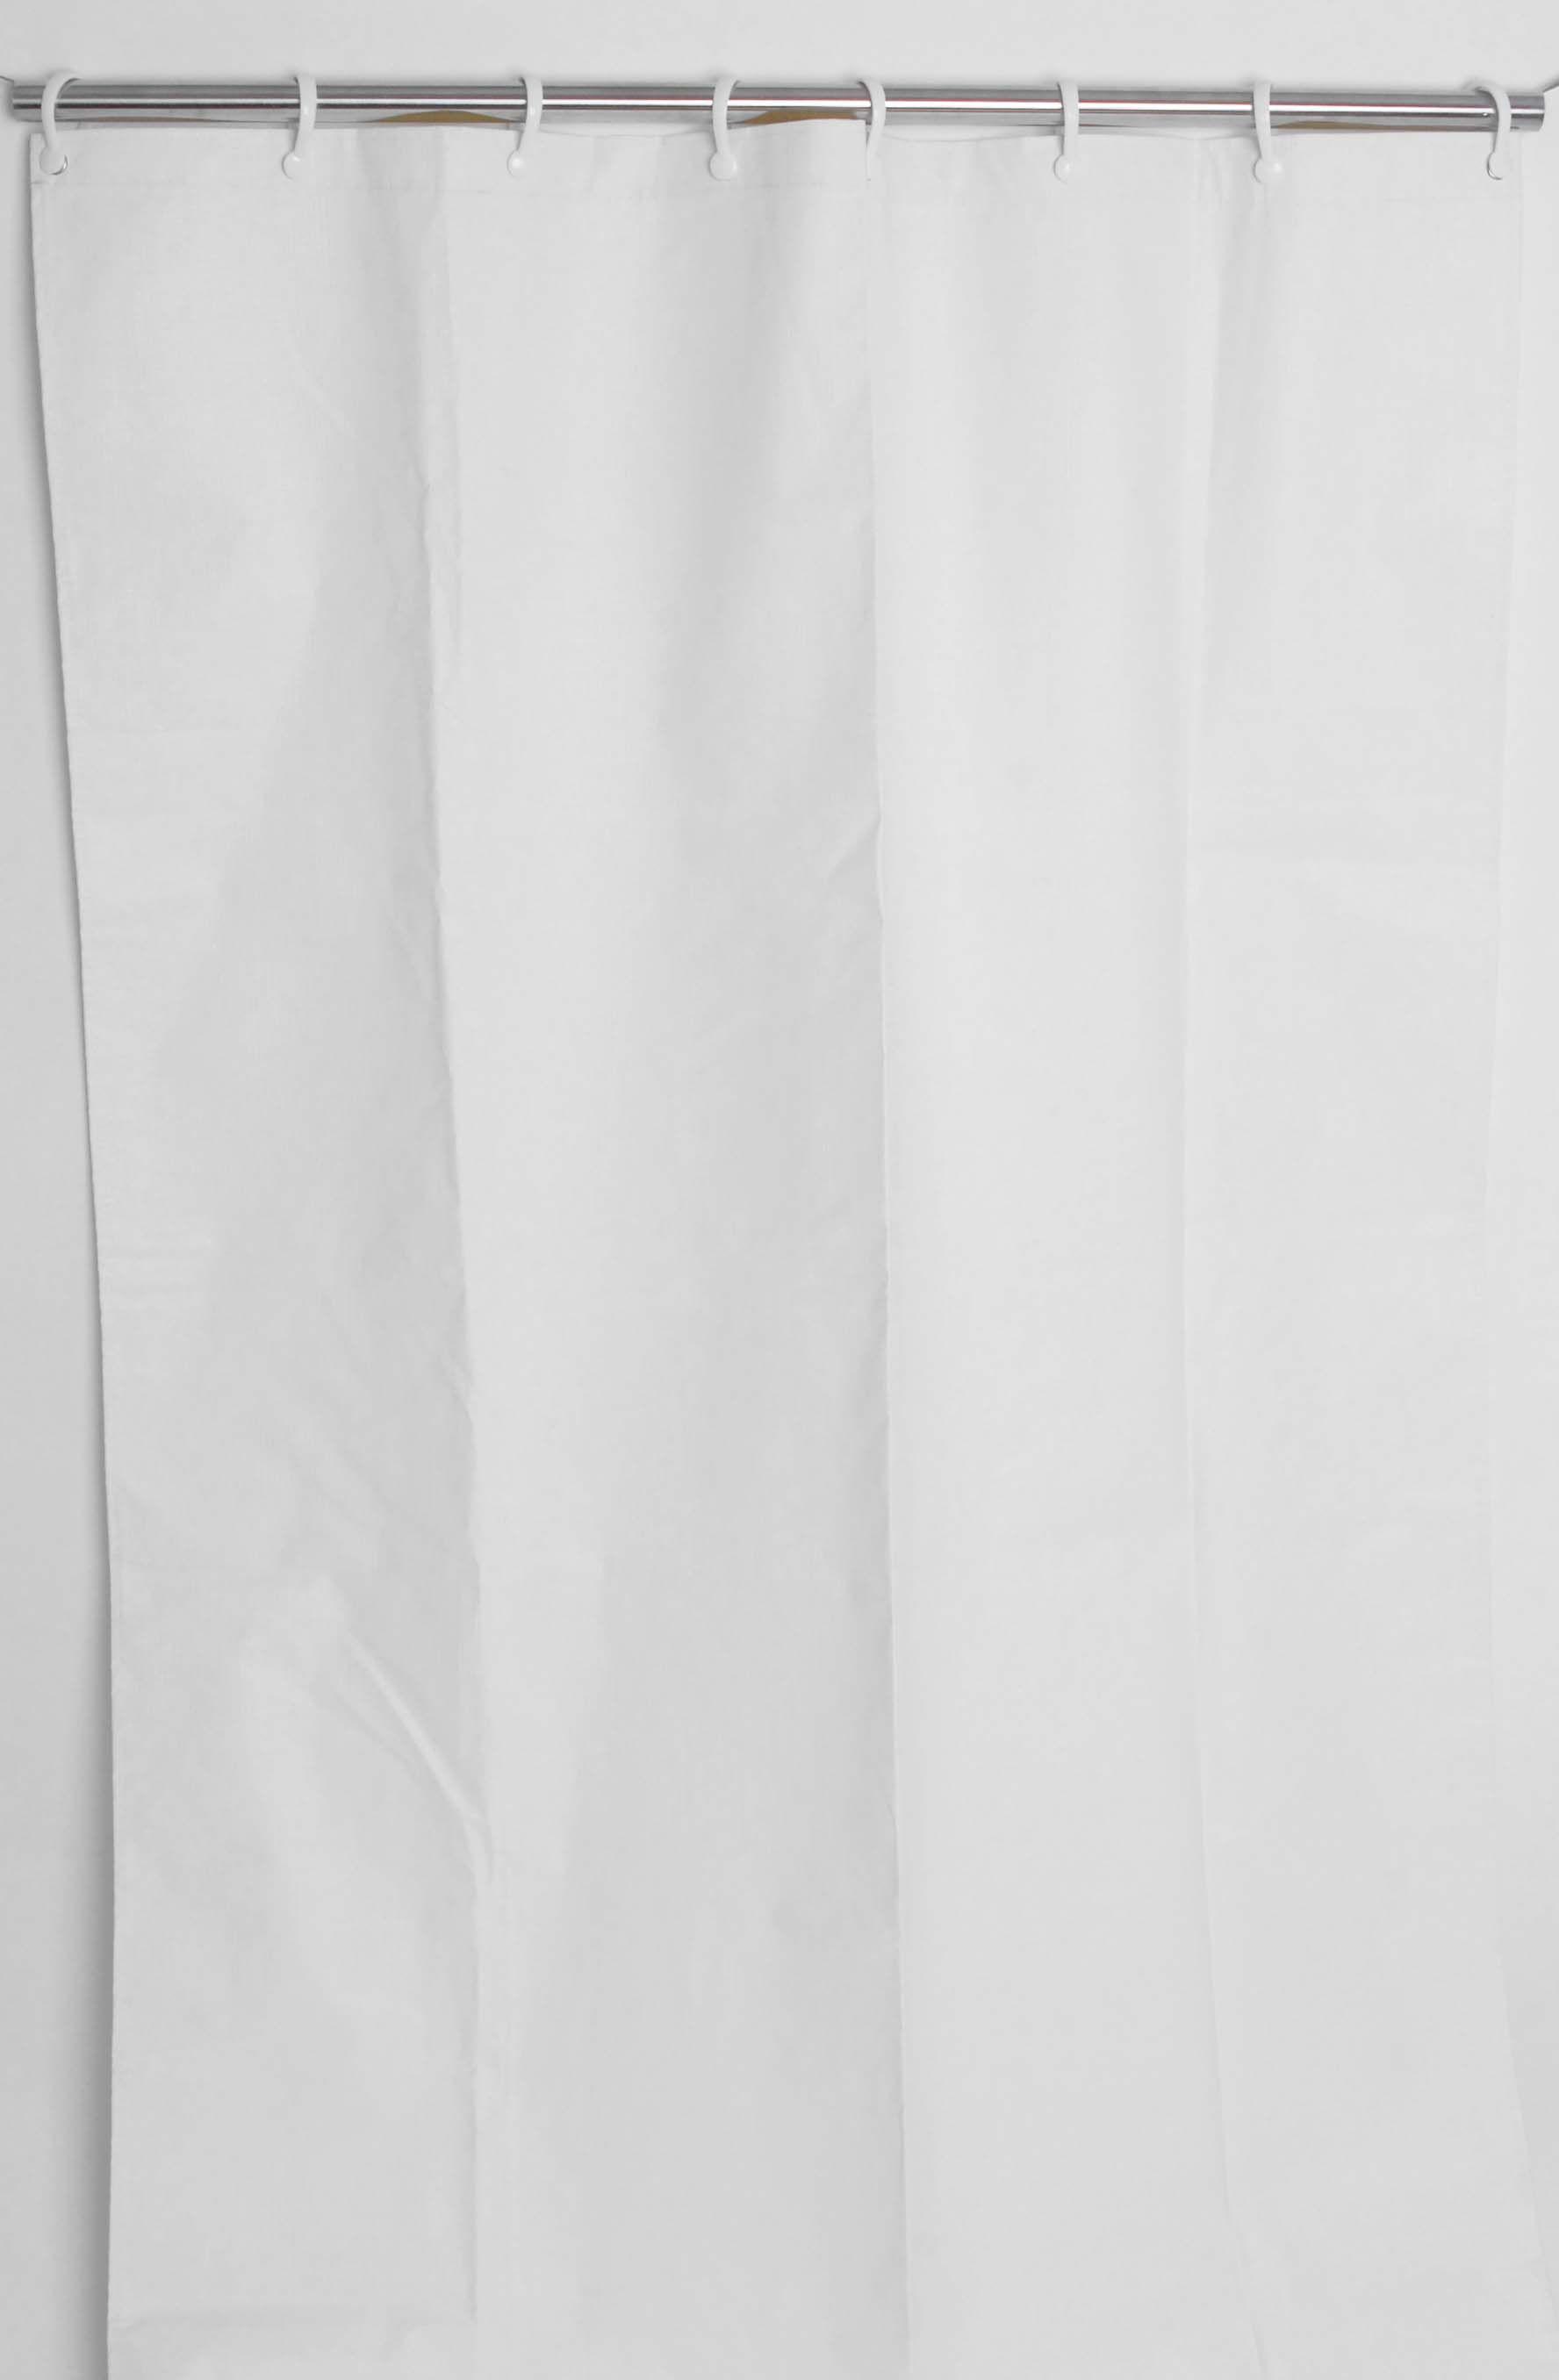 Triple Ply Vinyl Heavy Duty Shower Curtain Staph Resistant Mold